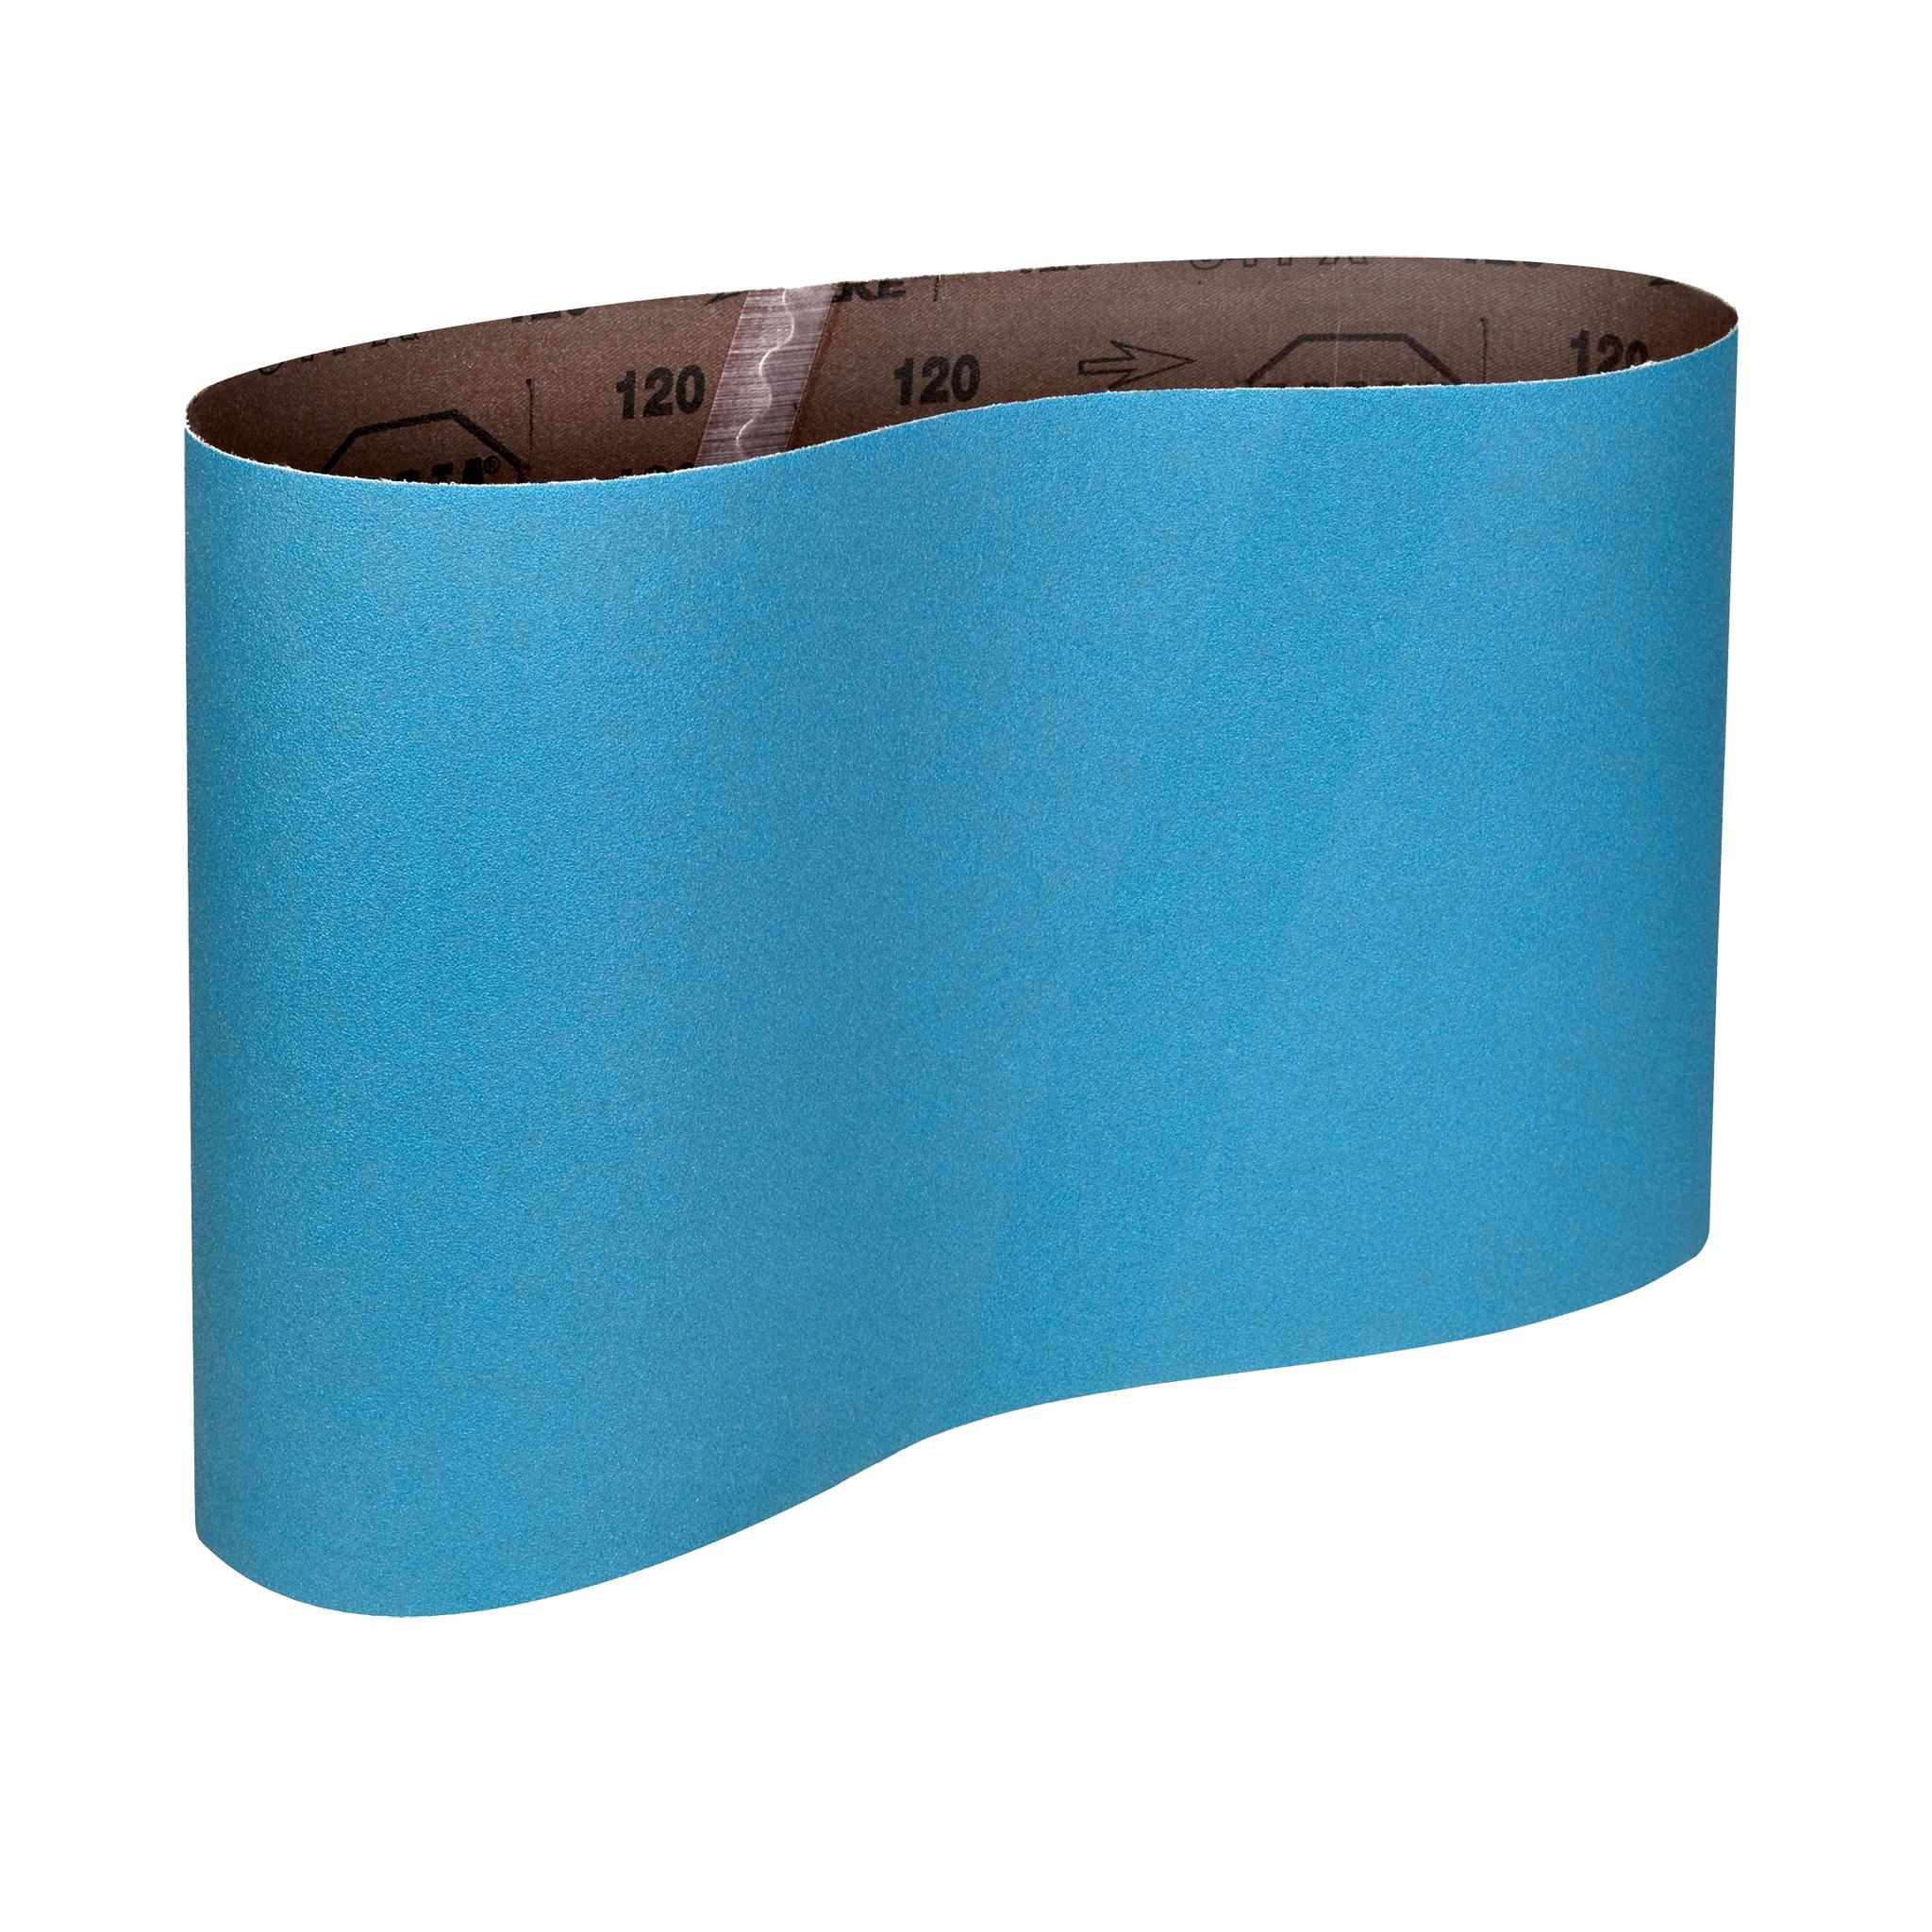 K 60 abrasive belt Parat Belts 200x750mm